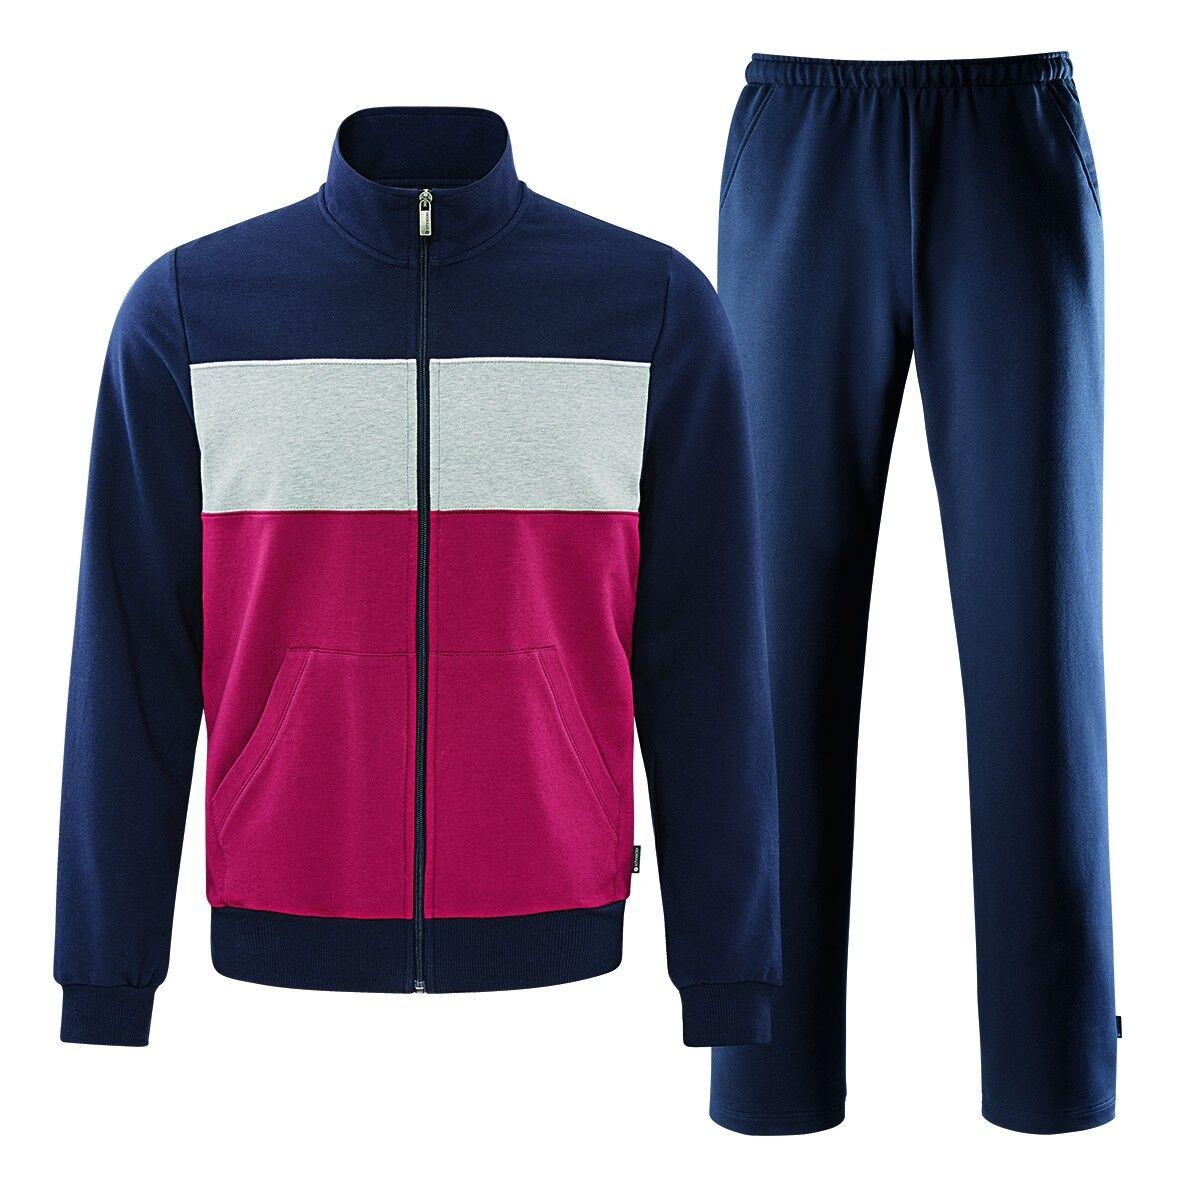 Schneider BLAIRM BLAIRM BLAIRM Herren Trainingsanzug Sportanzug Jogginganzug  | Nicht so teuer  d0fc33